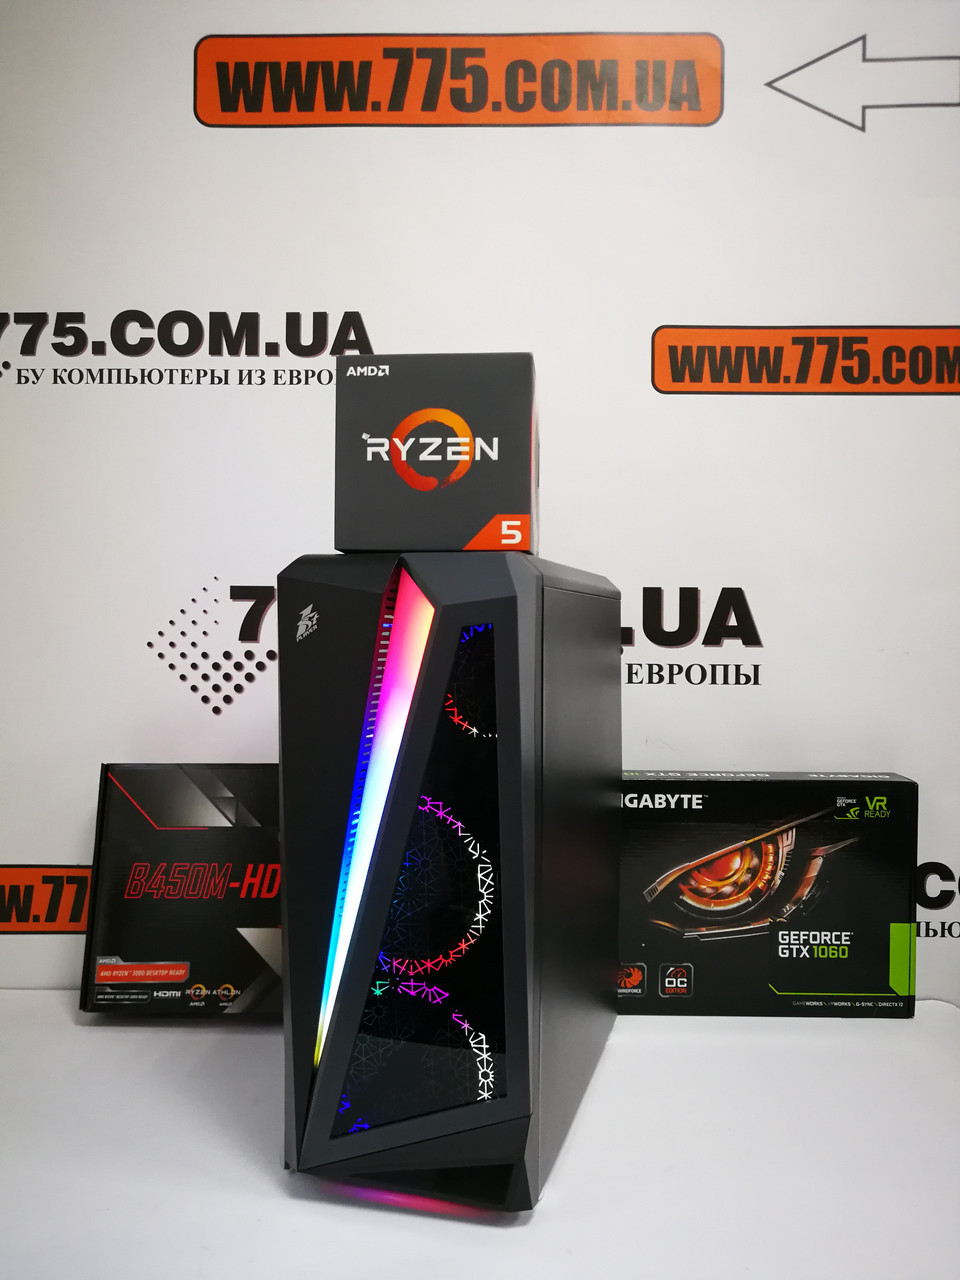 Игровой компьютер, AMD Ryzen 5 1600 3.20GHz (12 потоков), 16ГБ DDR4, SSD 240ГБ, HDD 1ТБ, GTX 1060 6ГБ